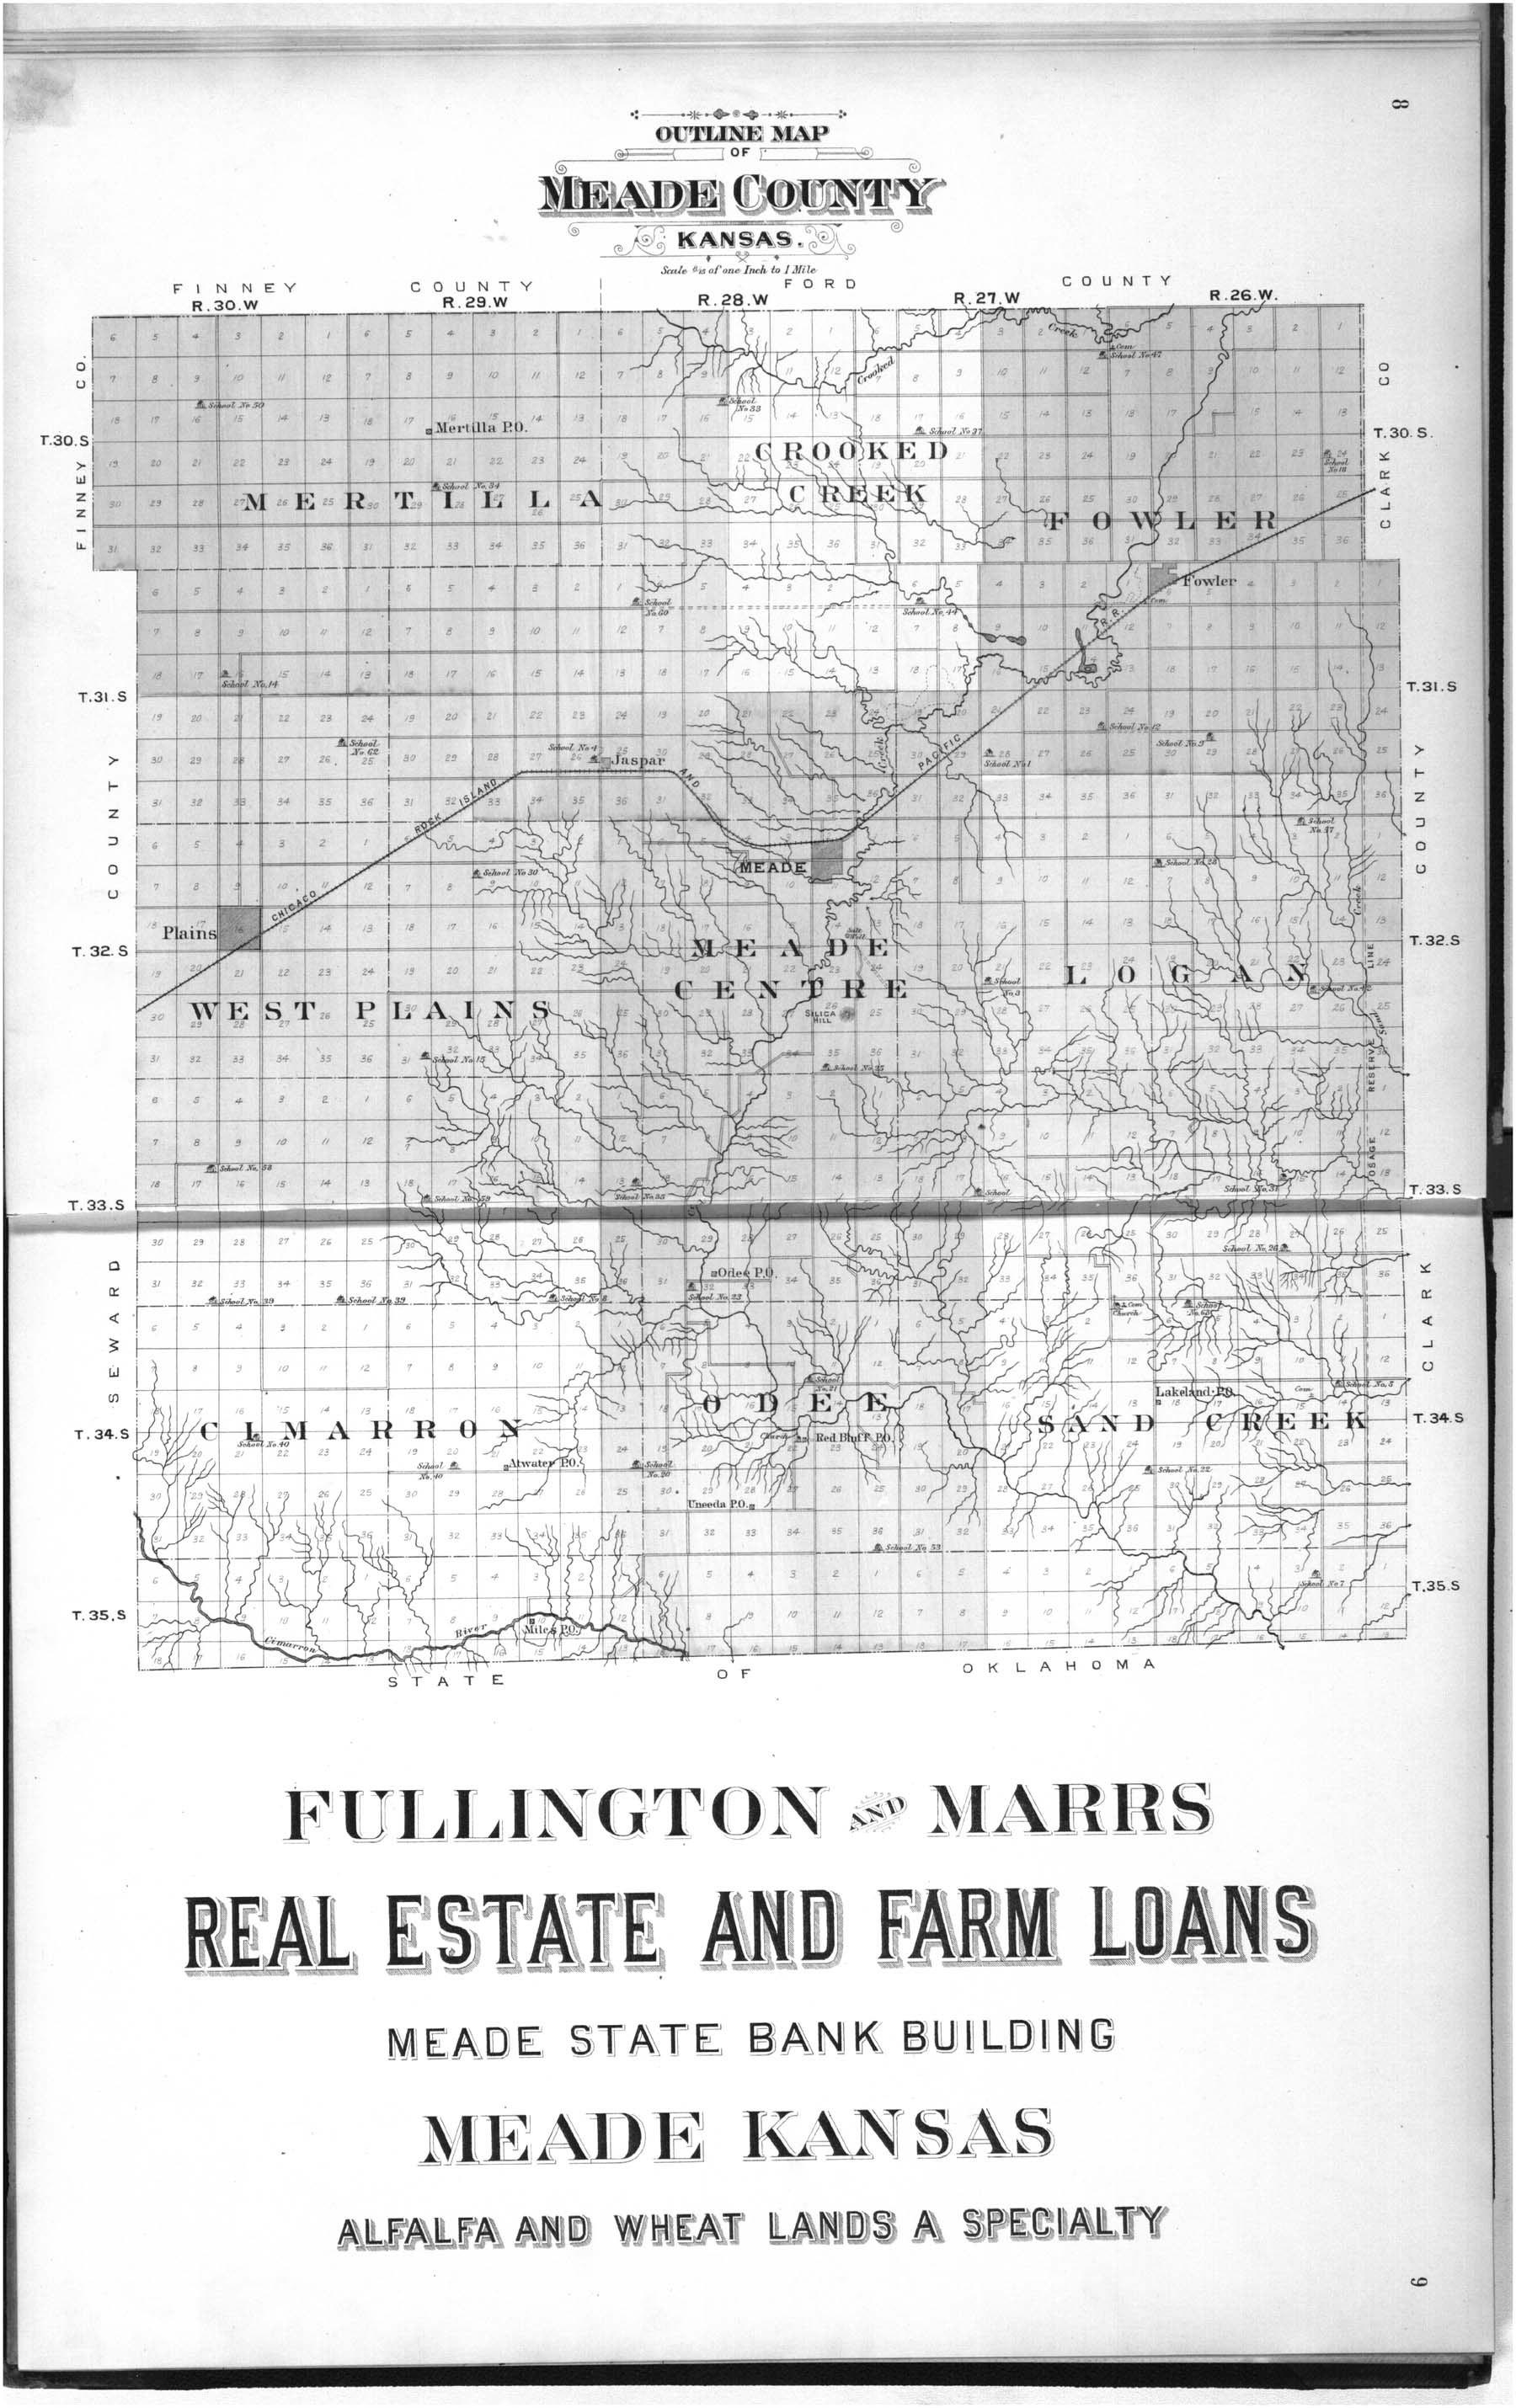 Plat book of Meade County, Kansas - 8 & 9